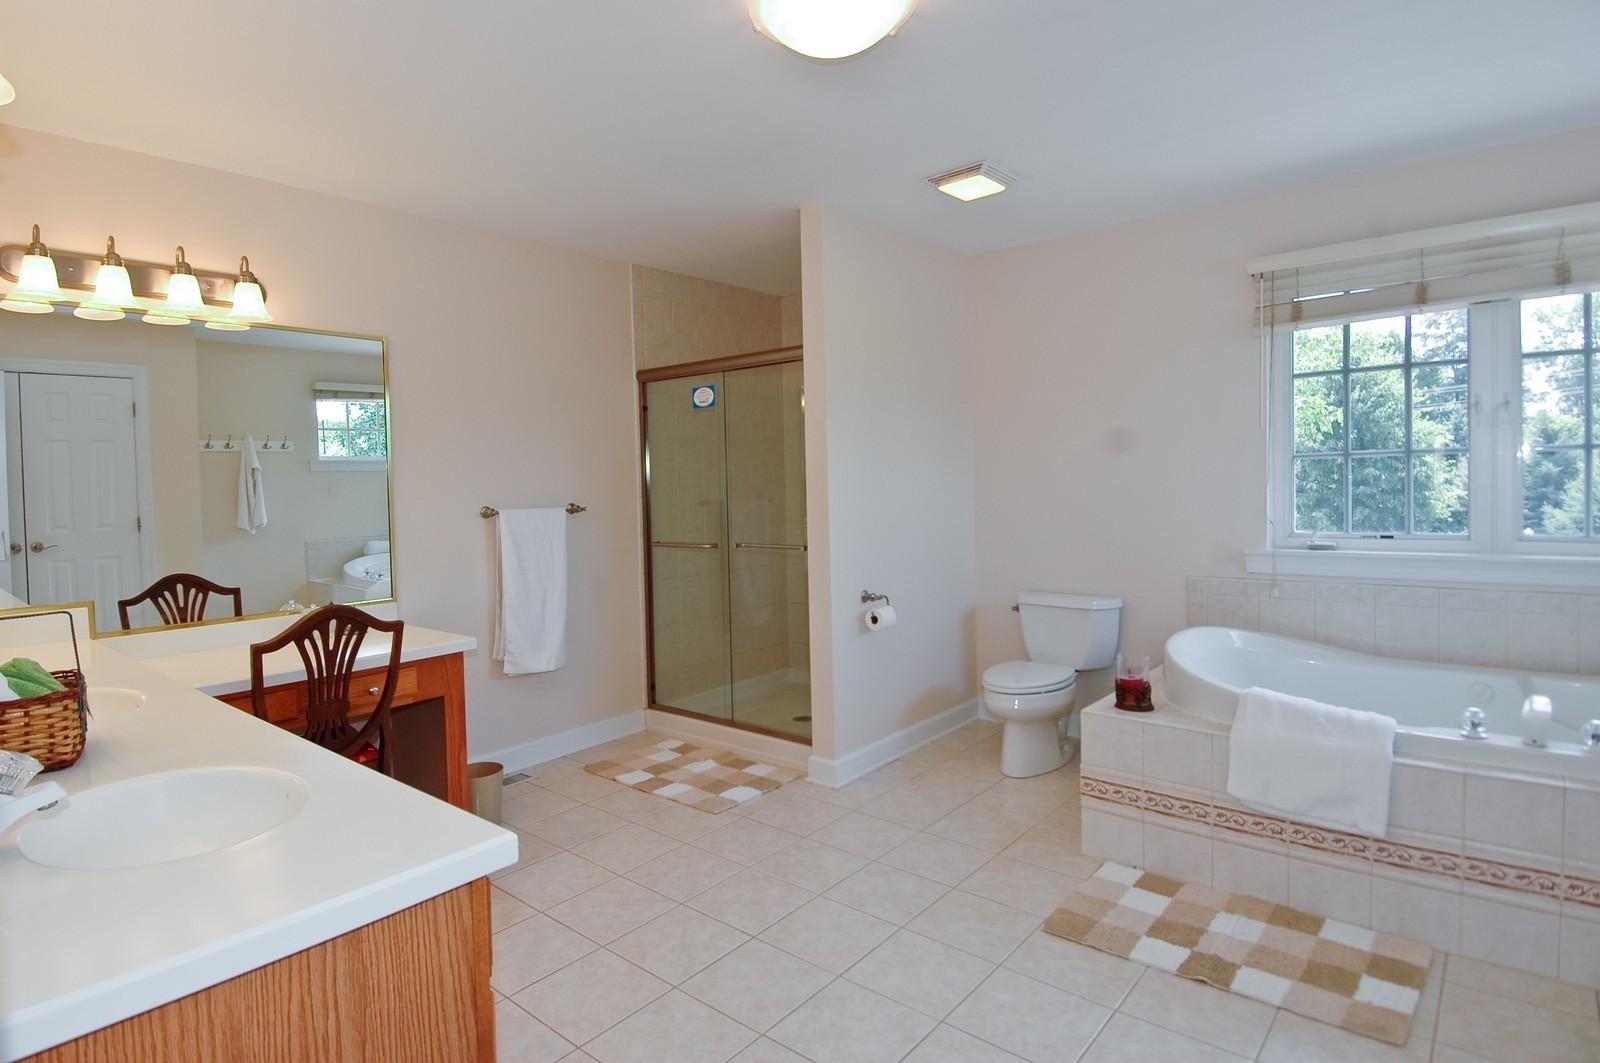 Real Estate Photography - 4215 Alex, Crystal Lake, IL, 60014 - Master Bathroom